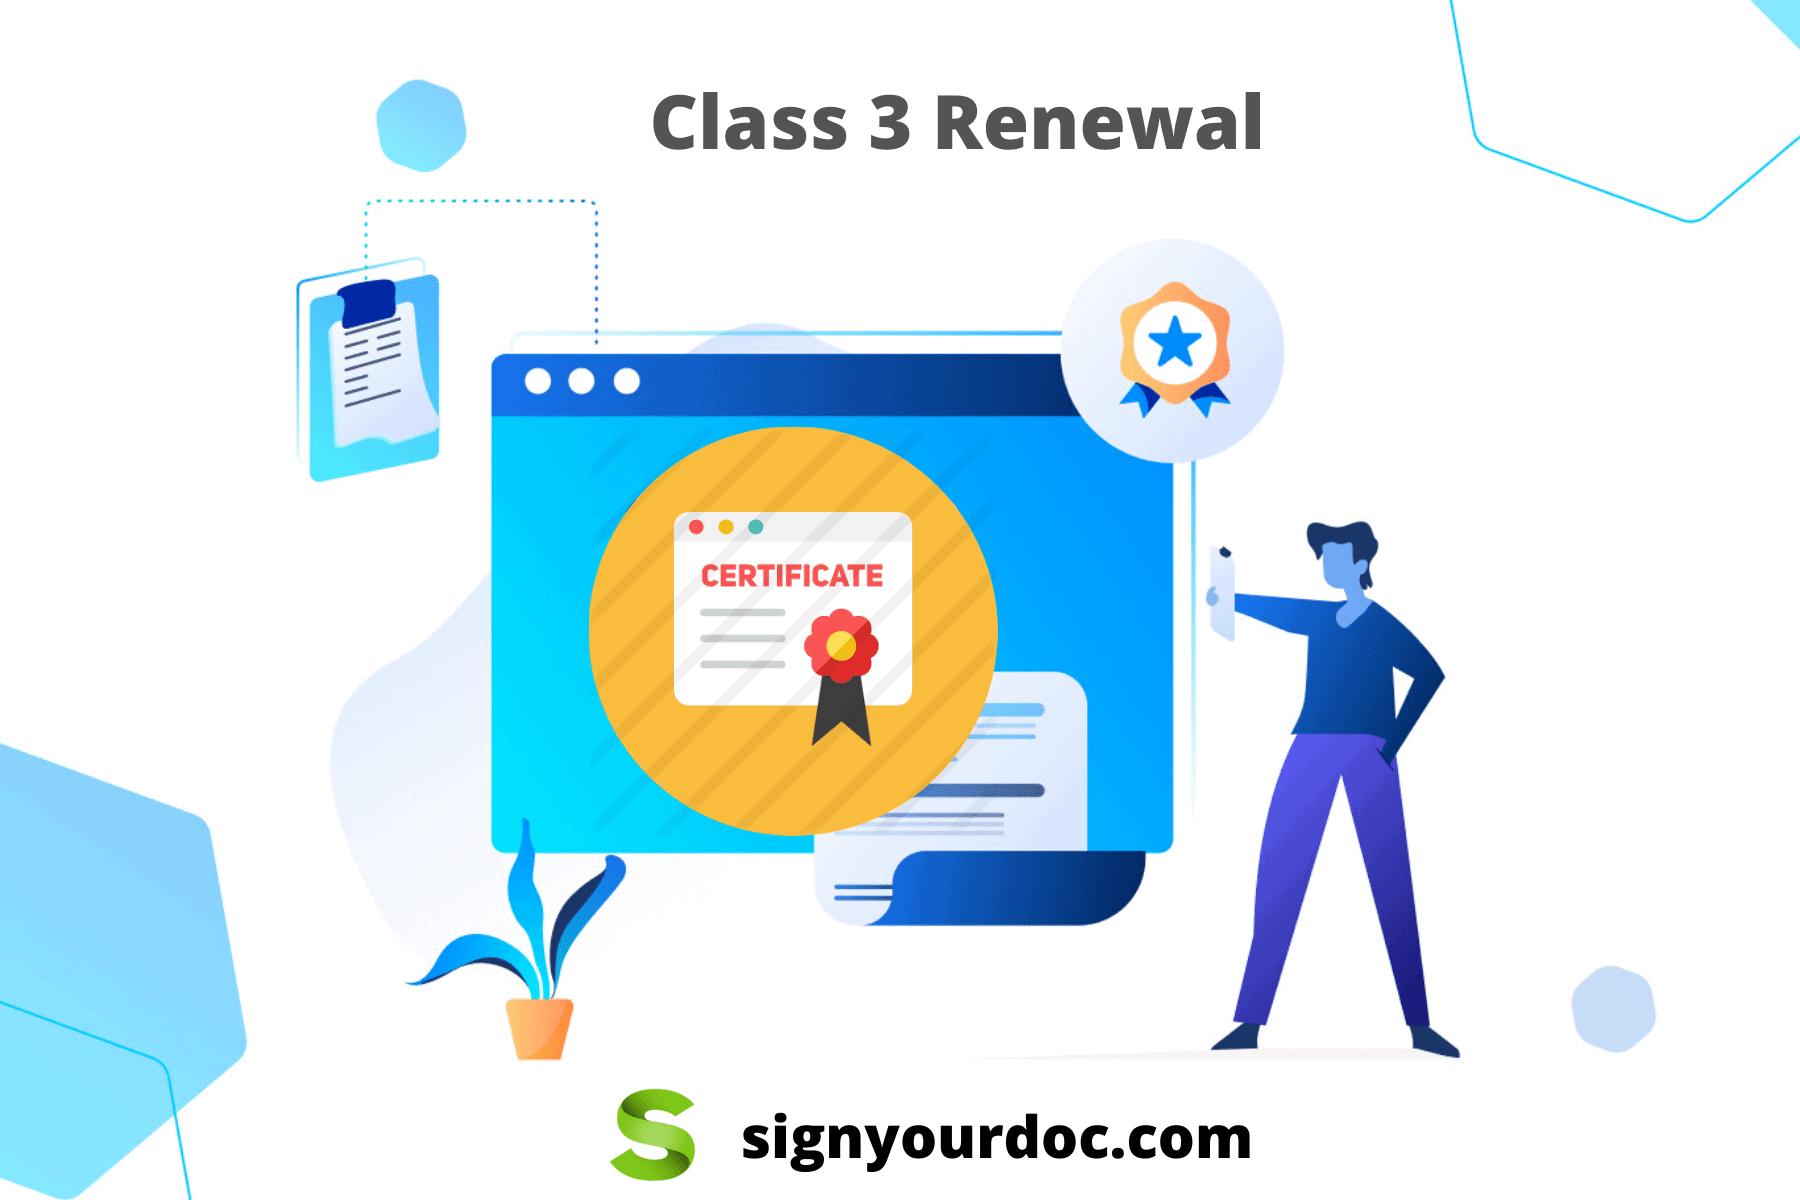 Class 3 renewal Digital signature